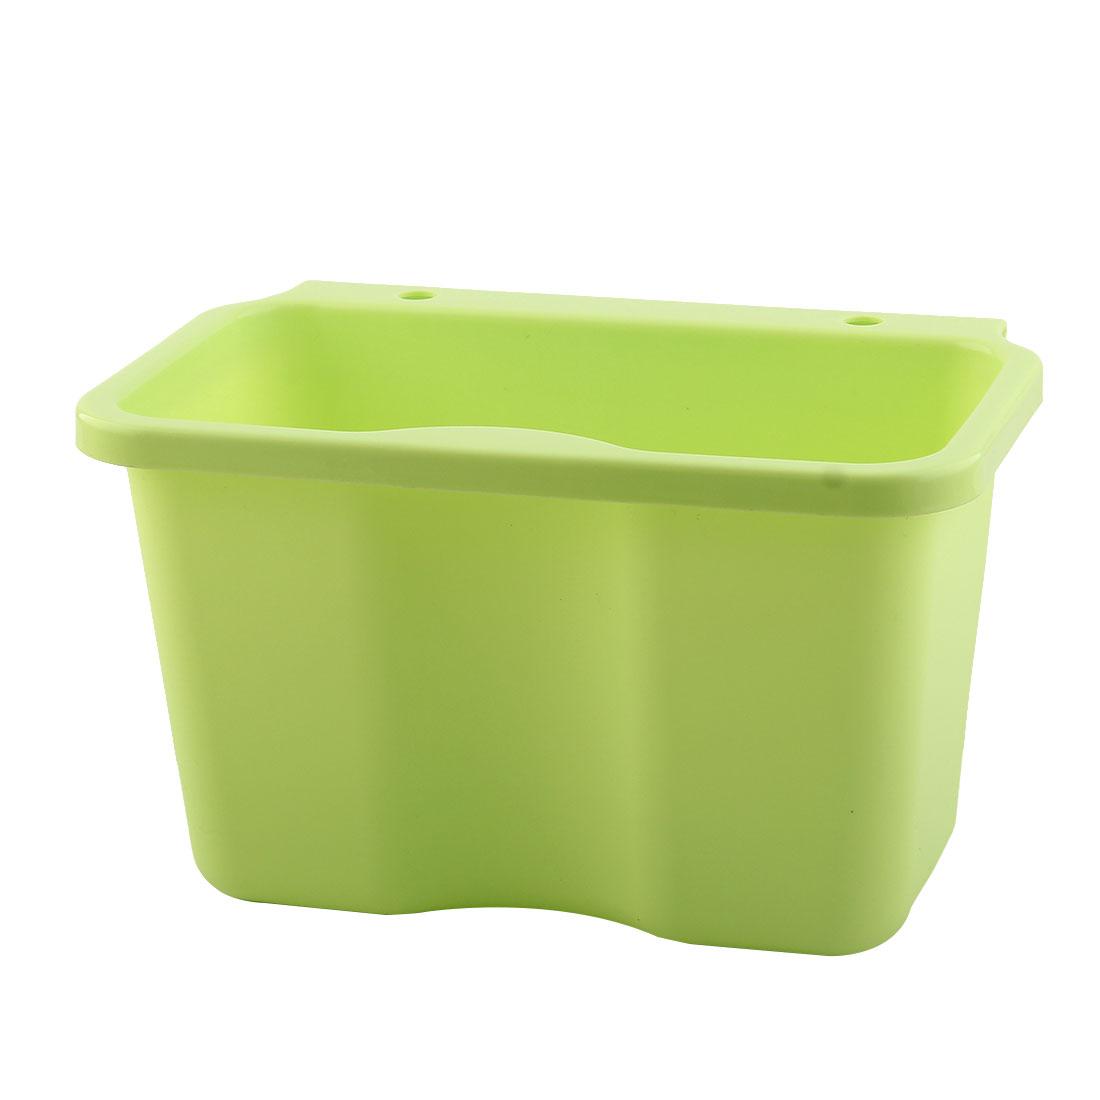 Kitchenware Plastic Rectangle Hanging Sundries Rubbish Storage Box Basket Green